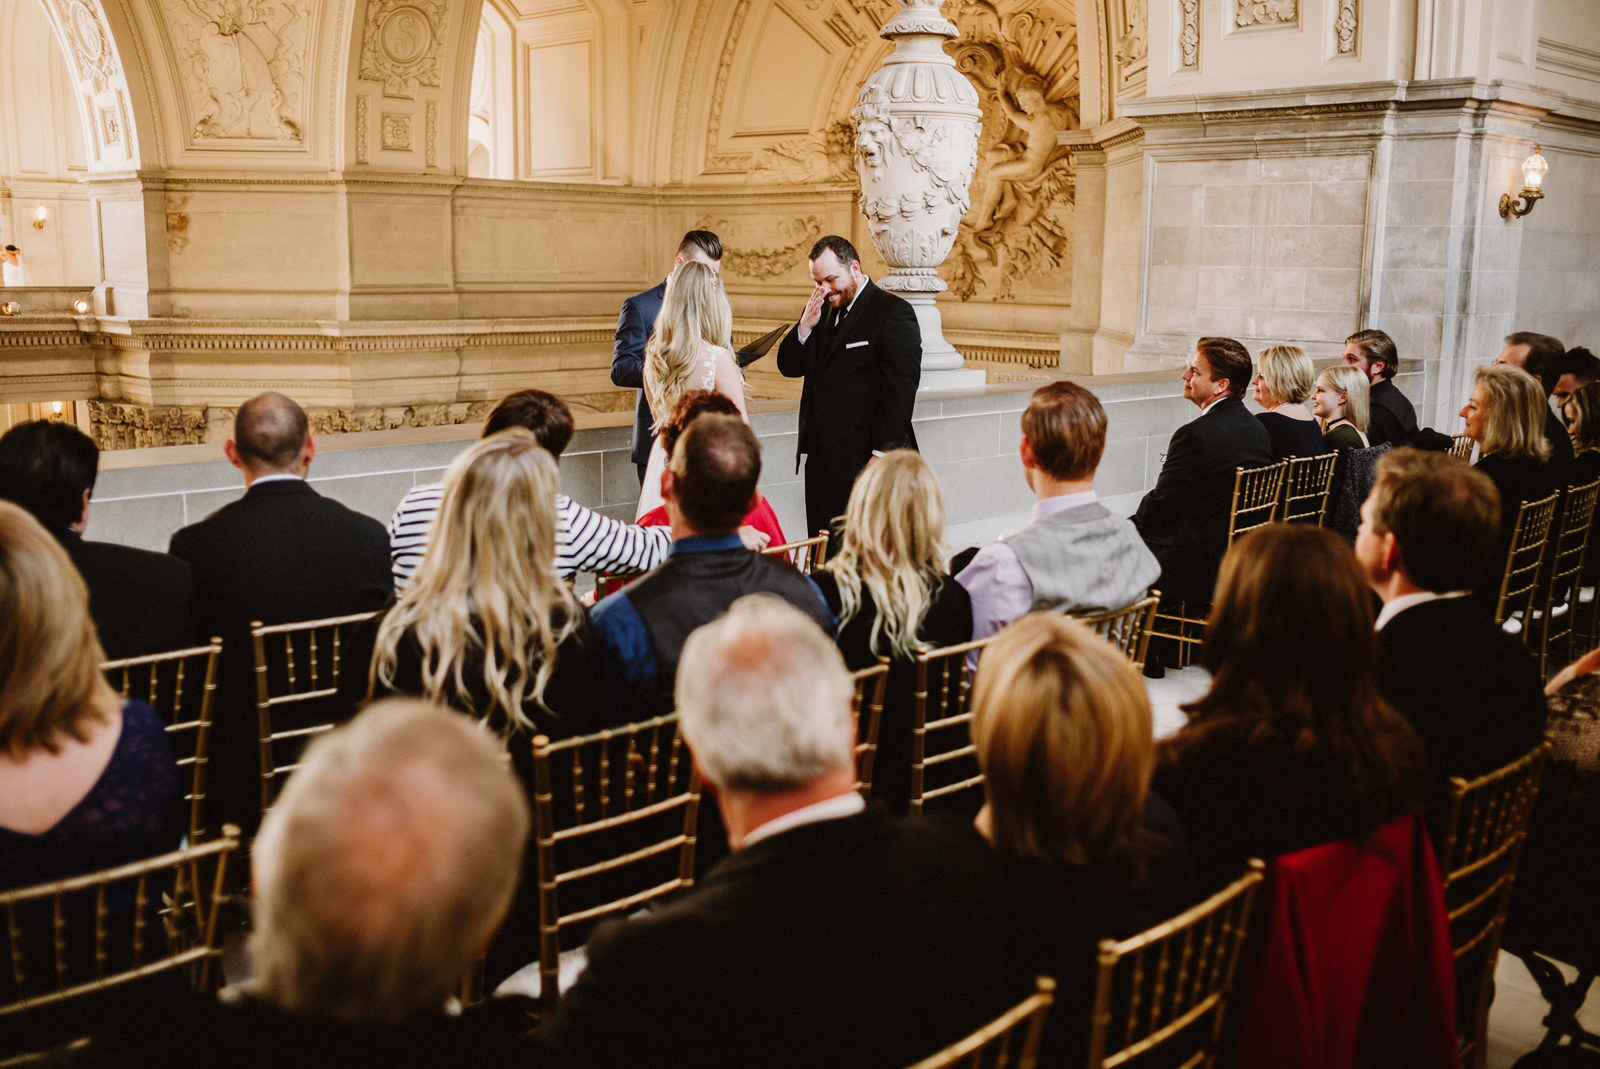 san-francisco-city-hall-elopement-15 SAN FRANCISCO CITY HALL INTIMATE WEDDING